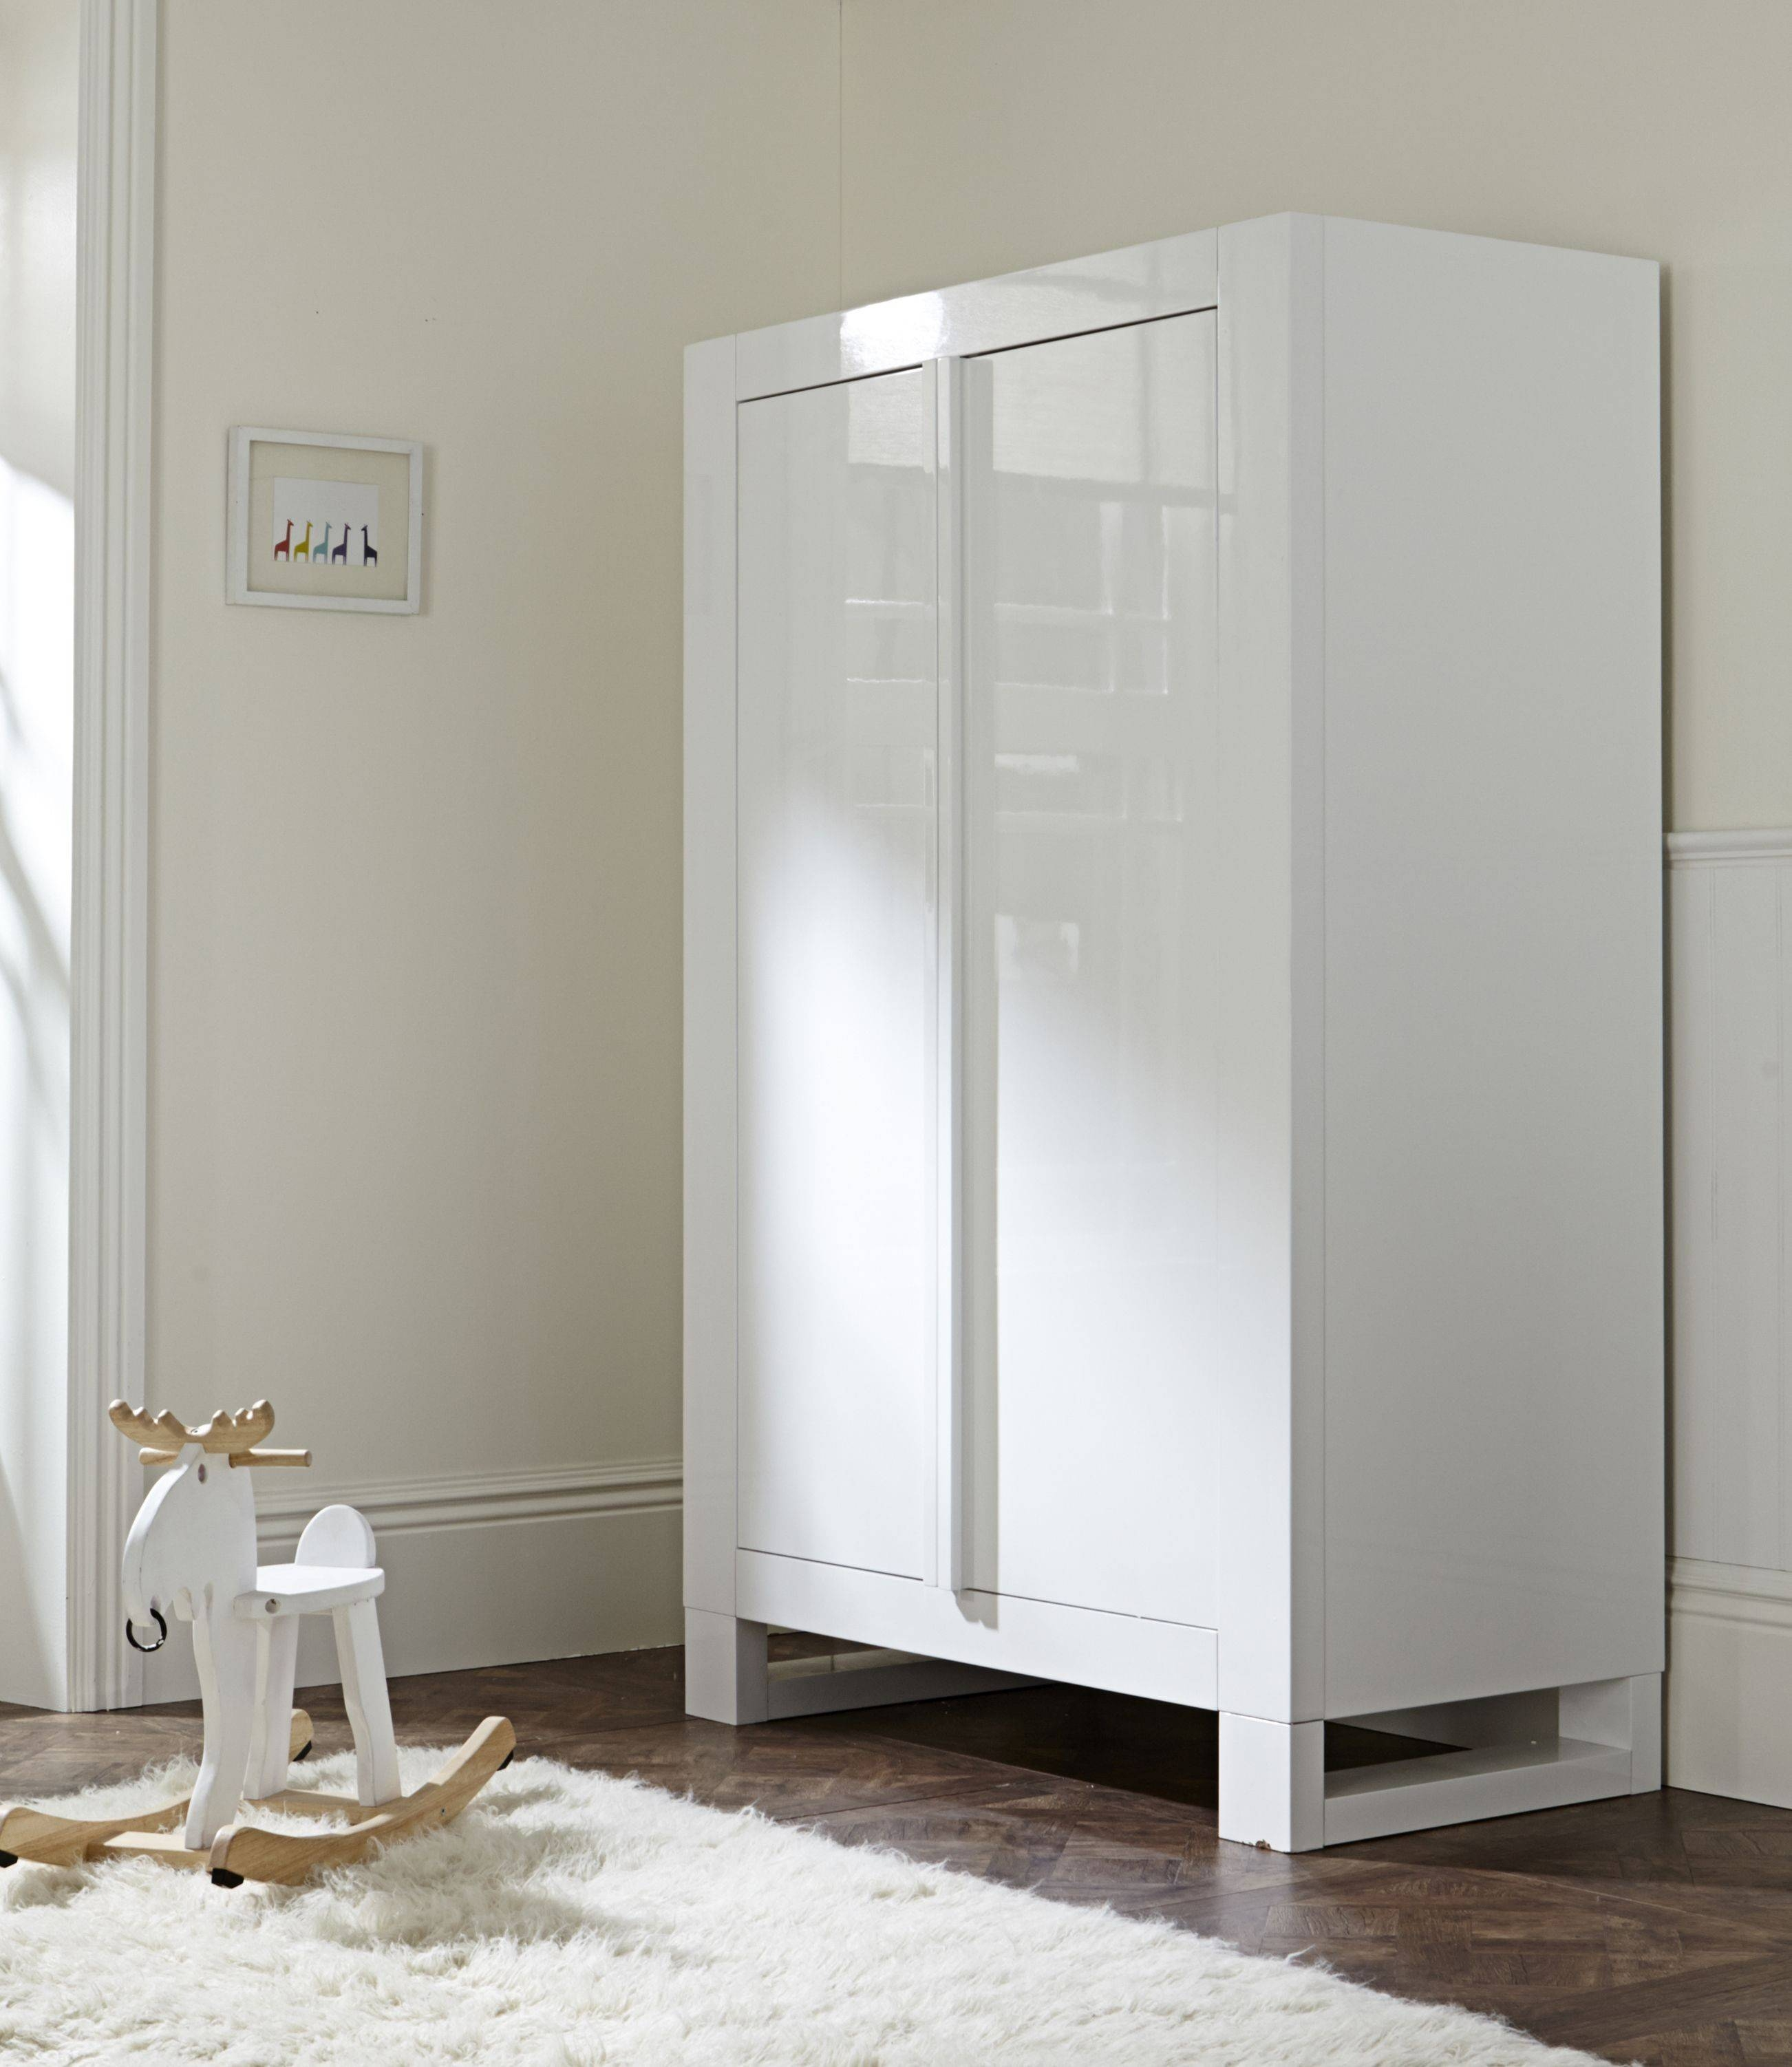 Rimini High Gloss White Wardrobe |Baby Bedroom Wardrobe | Tutti in White High Gloss Wardrobes (Image 10 of 15)